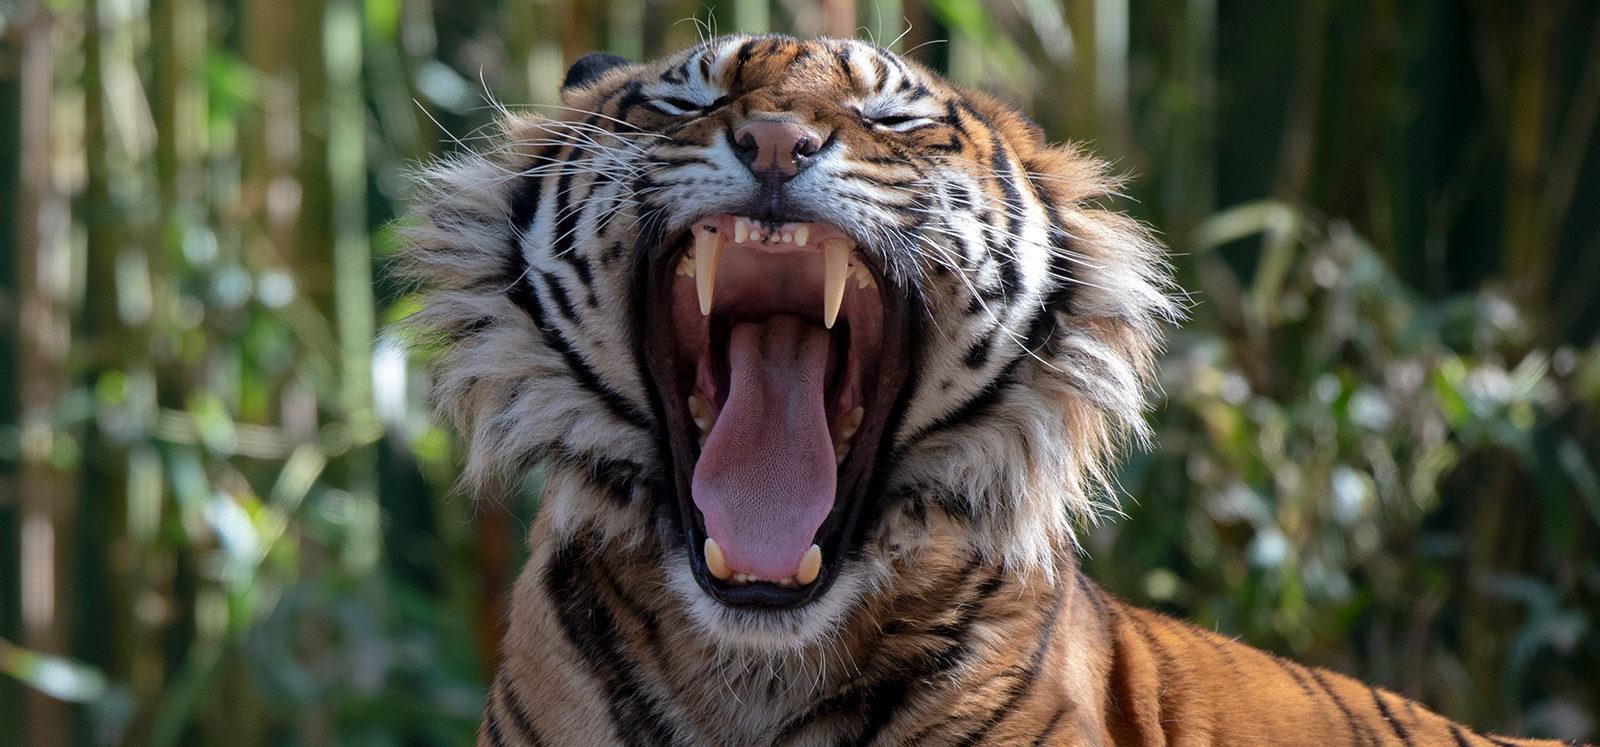 Sumatran Tiger roaring at Adelaide Zoo